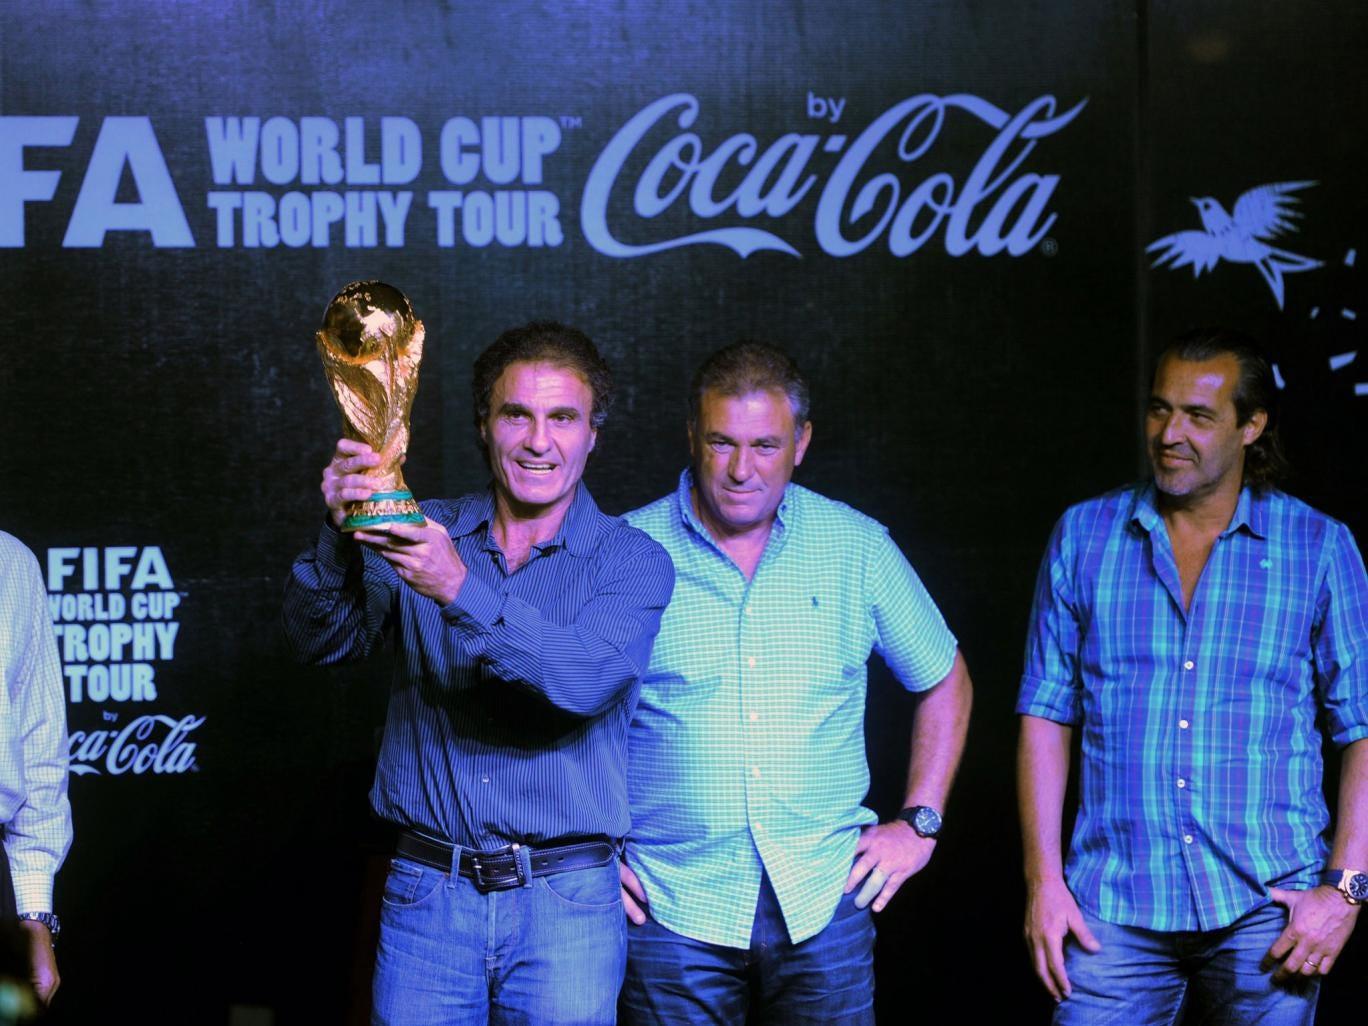 Argentine former football player Oscar Ruggeri (2-L) holds up the FIFA World Cup next to Argentine former football players Ubaldo Matildo Fillol (L), Julio Olarticoechea (2-R) and Sergio Batista (R) in Mar del Plata, Argentina on January 13, 2014, where i